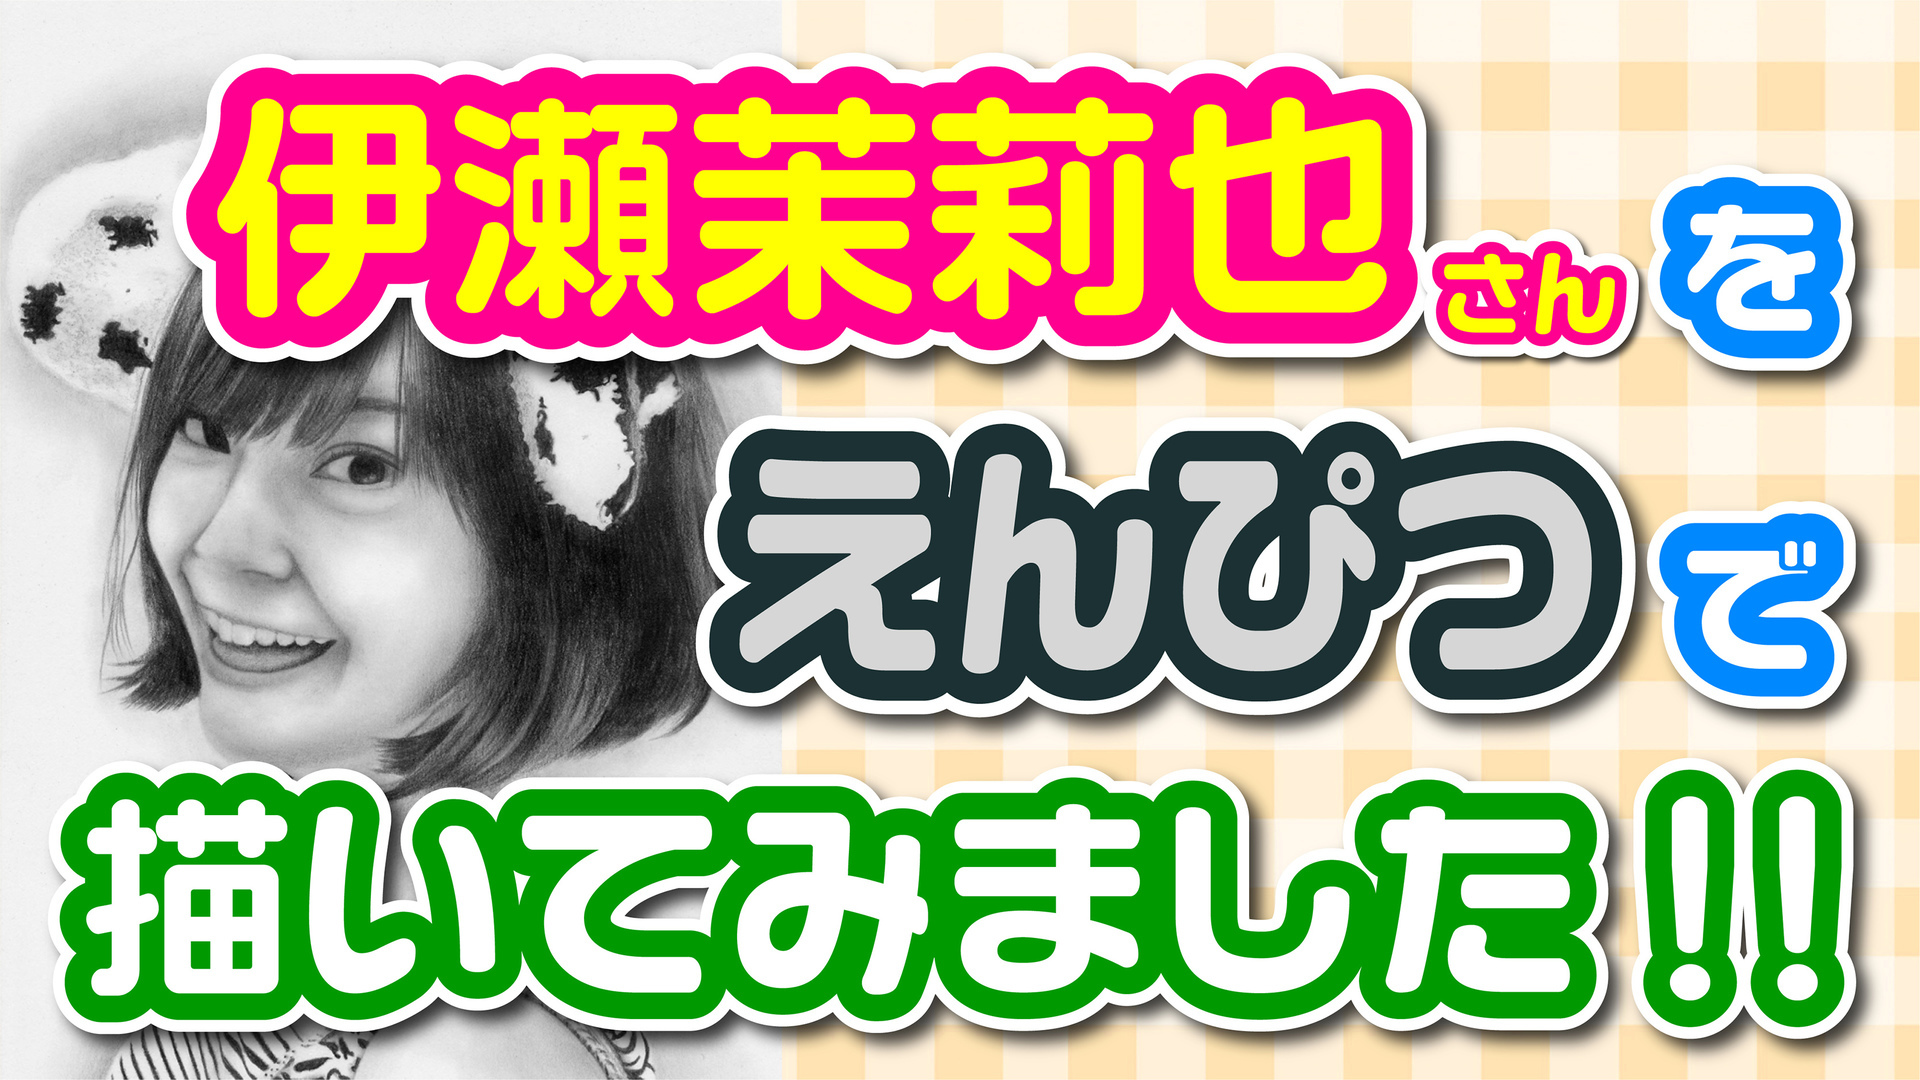 Youtubeサムネイル7.jpg